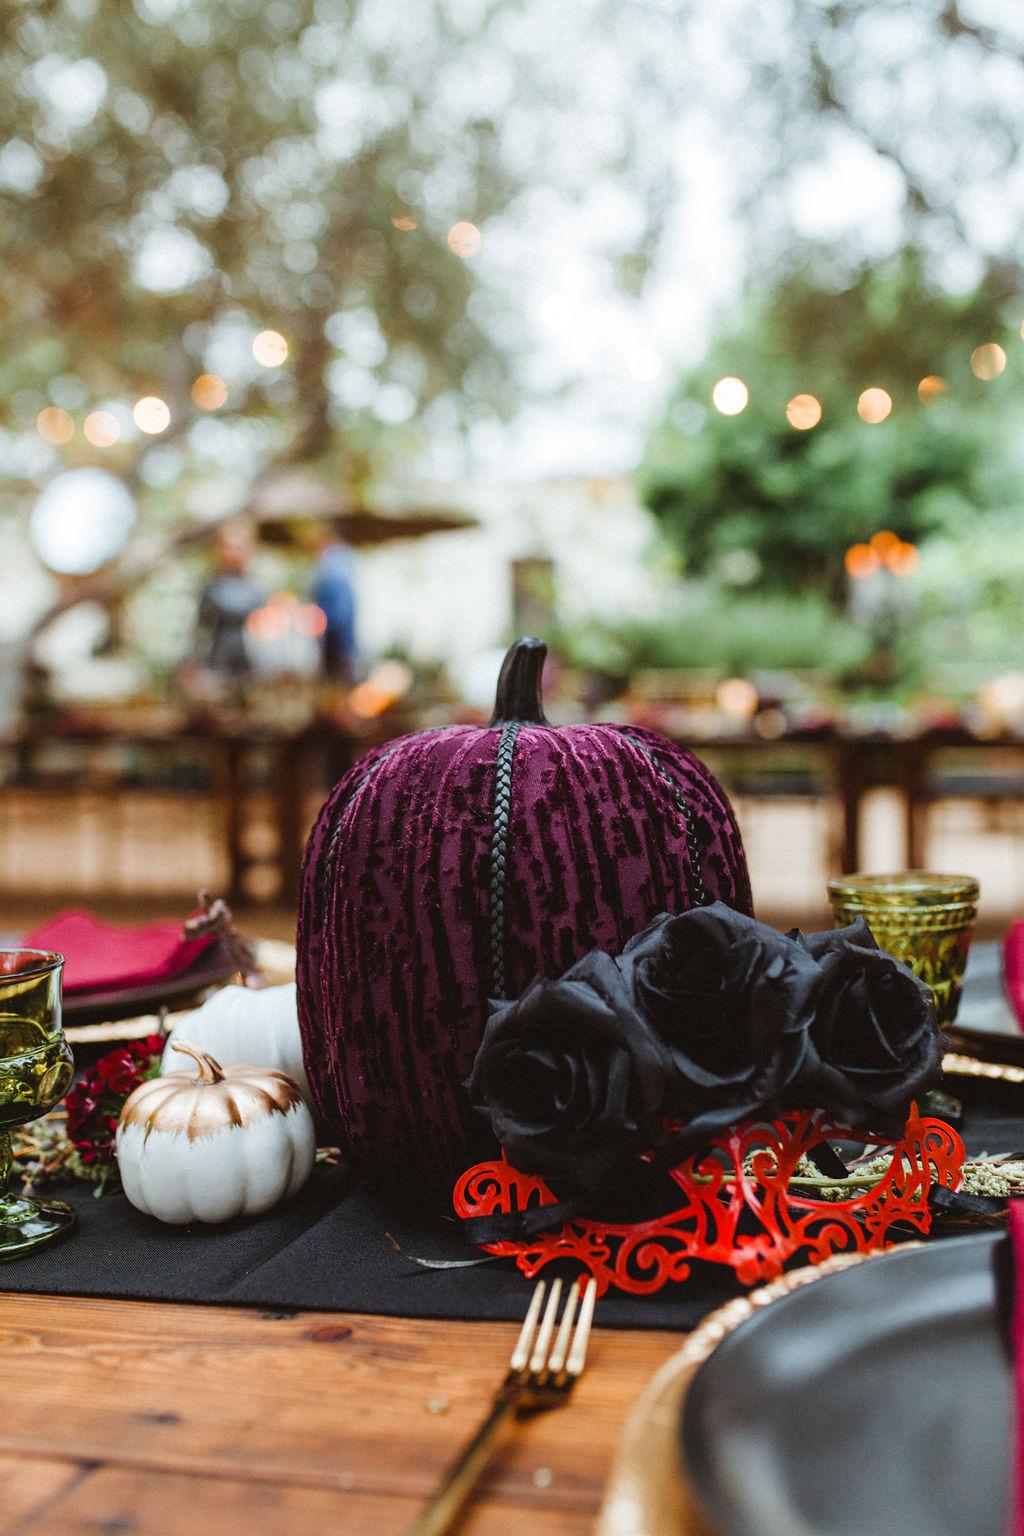 October-Details-Wedding-Pasadena-California-Halloween-Tim-Burton-Alice-Wonderland-Whimsical-Hieusz-Photography-41.jpg